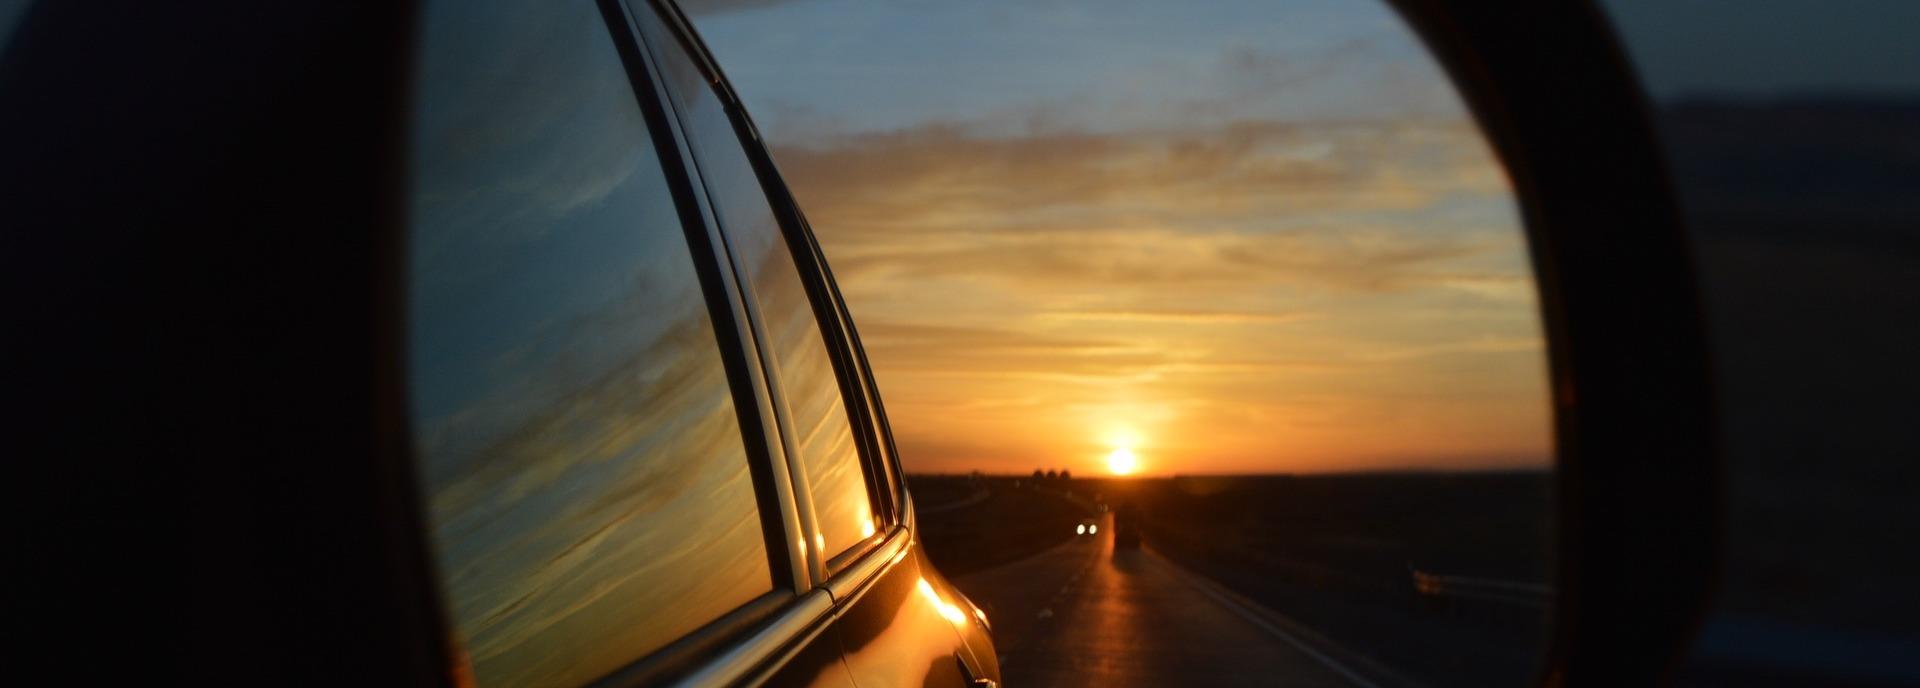 Rear view mirror 835085 1920